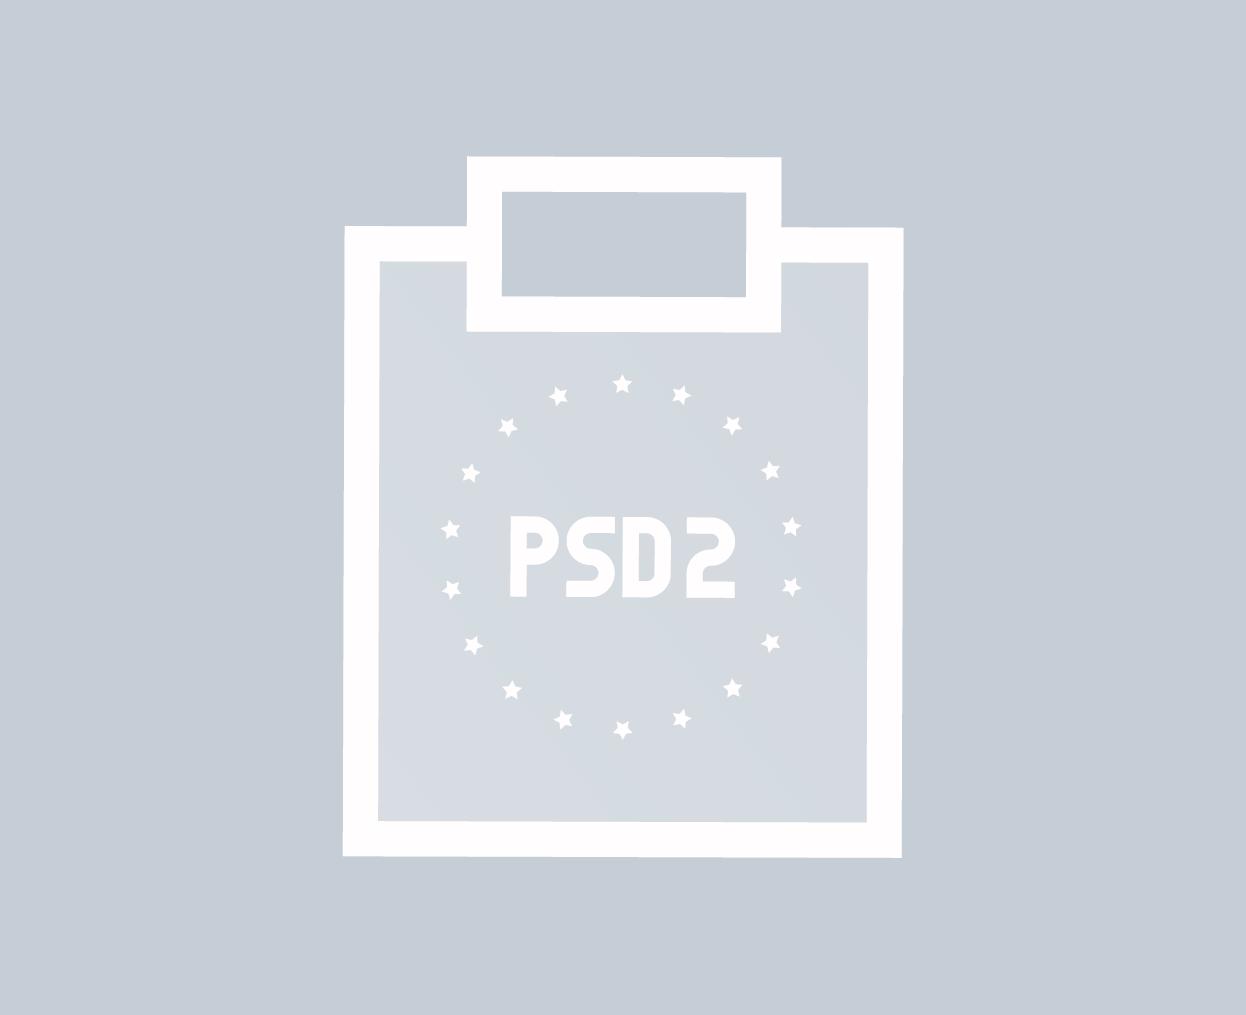 PSD2_Hero - 1245x1014